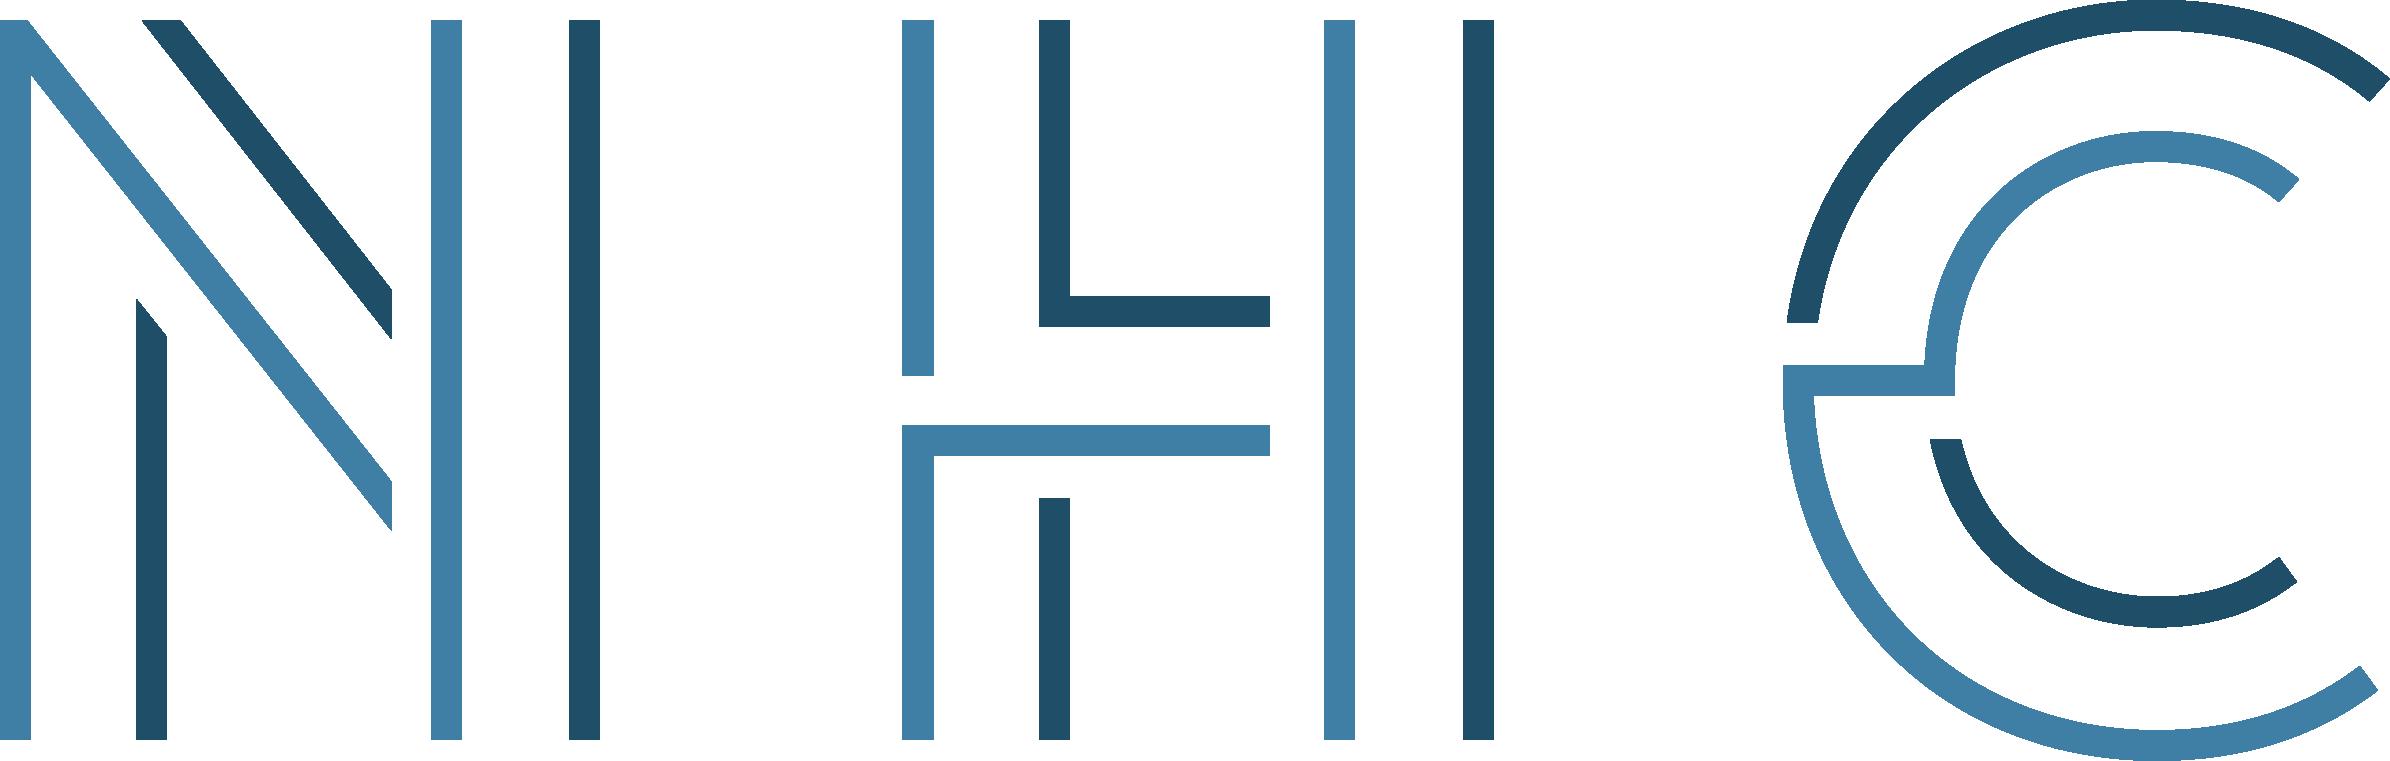 NHC logo 4f.png